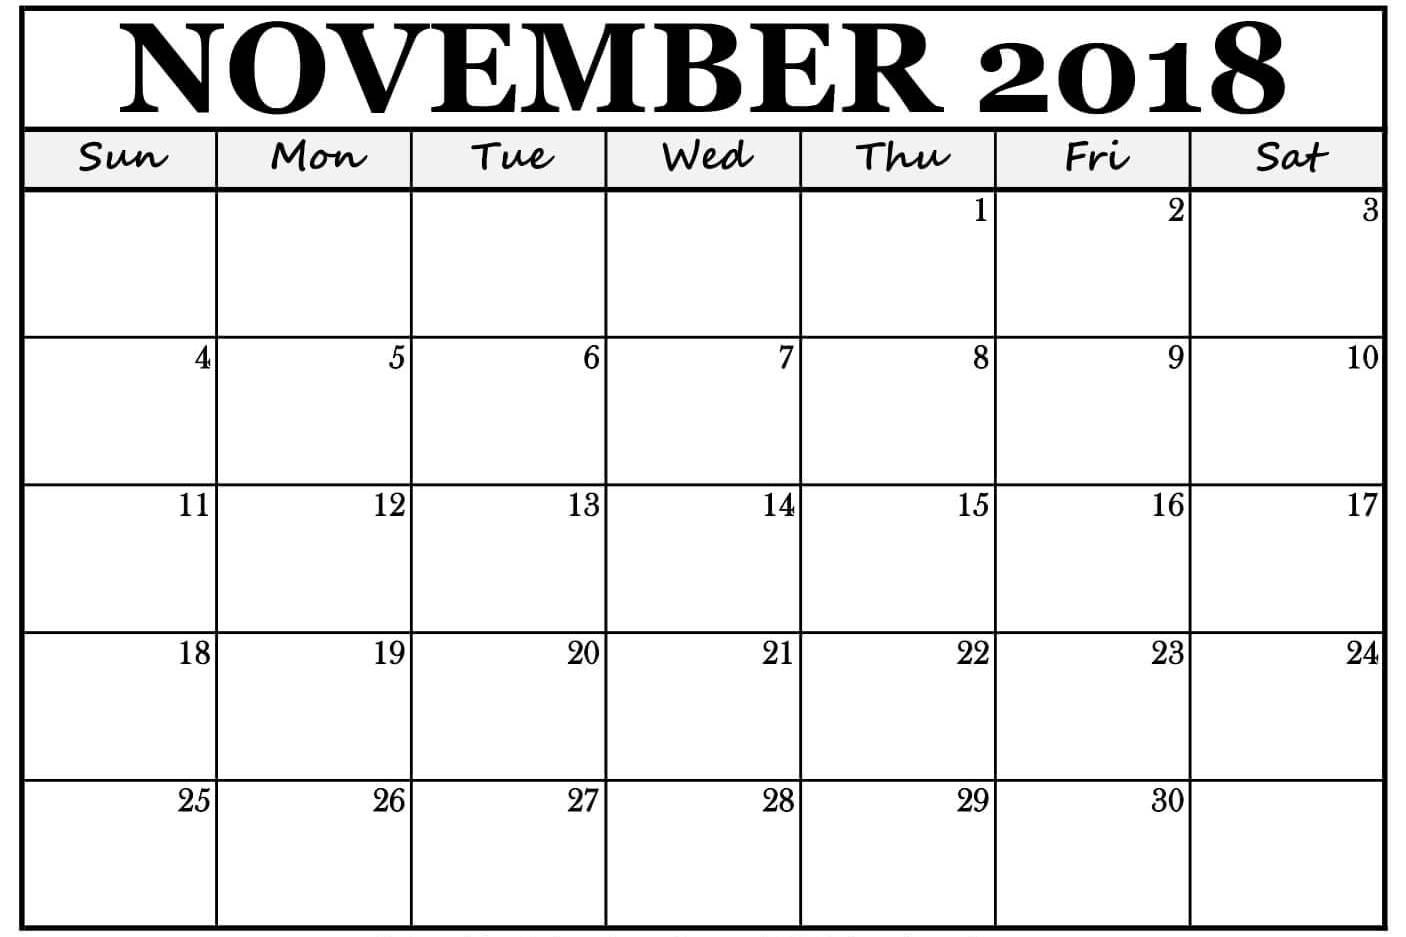 November 2018 Calendar New Zealand Printable